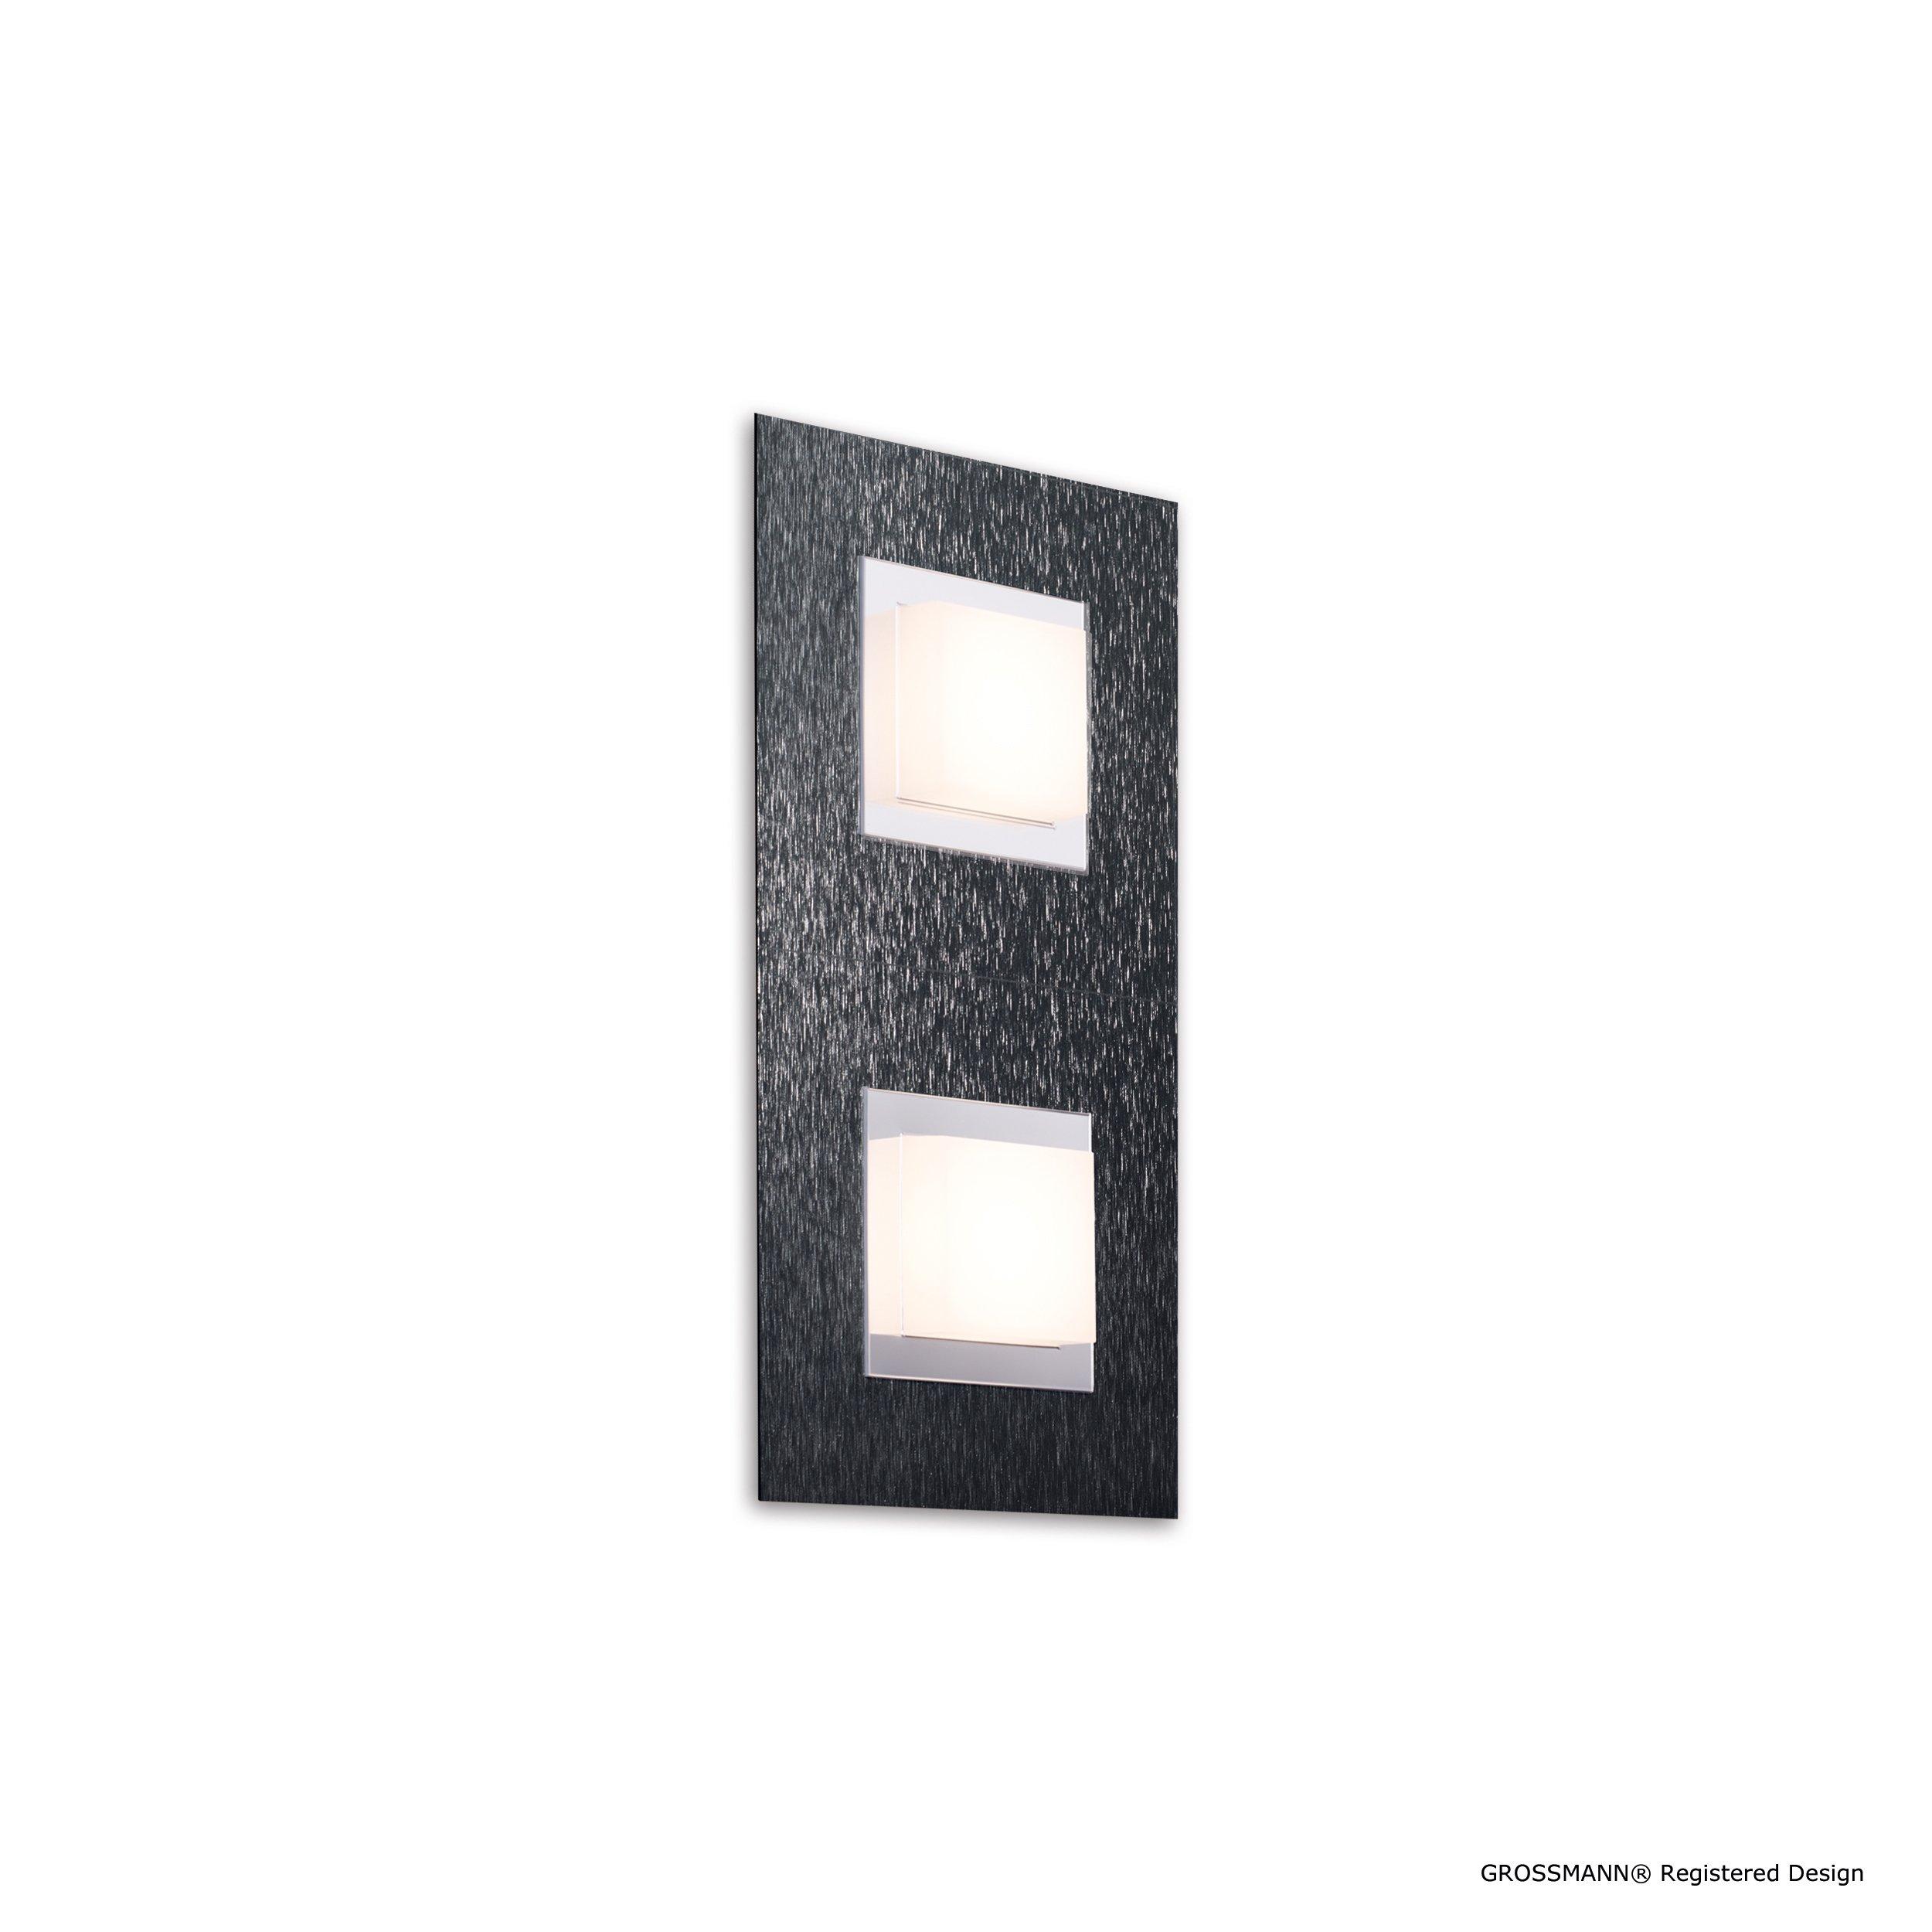 LED Deckenleuchte Basic